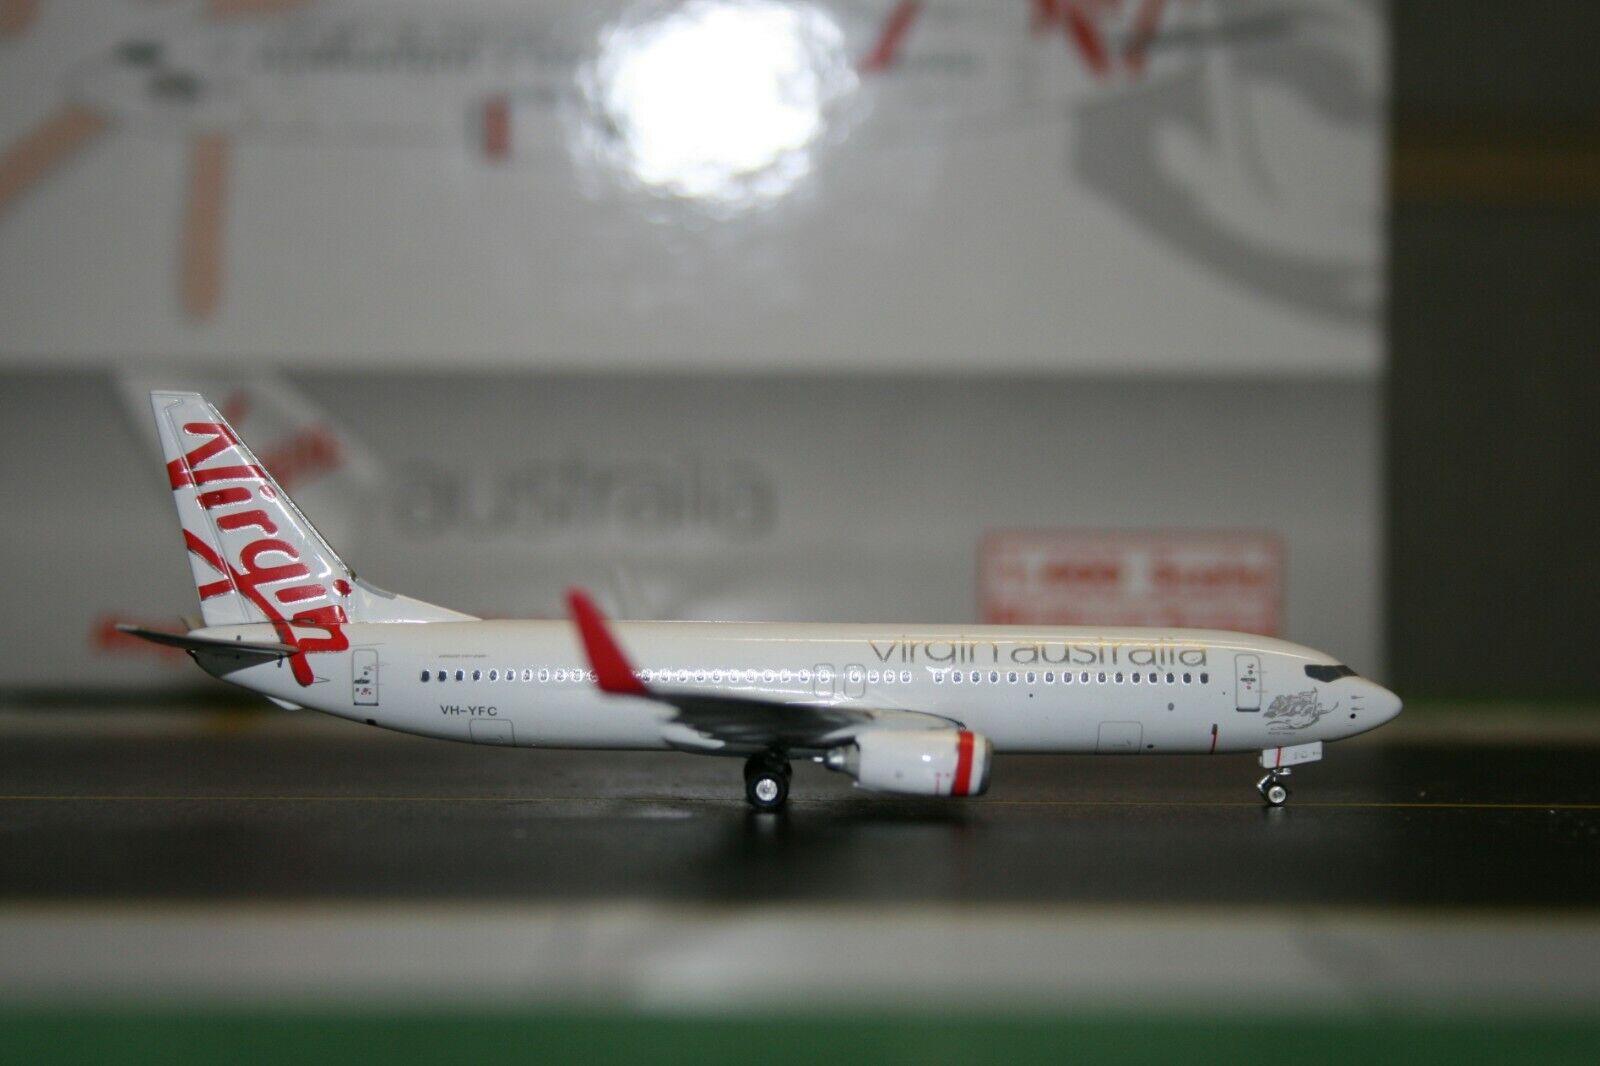 Phoenix 1 400 Virgin Australia Boeing 737-800 VH-YFC (PH10516) Förlaga Plan